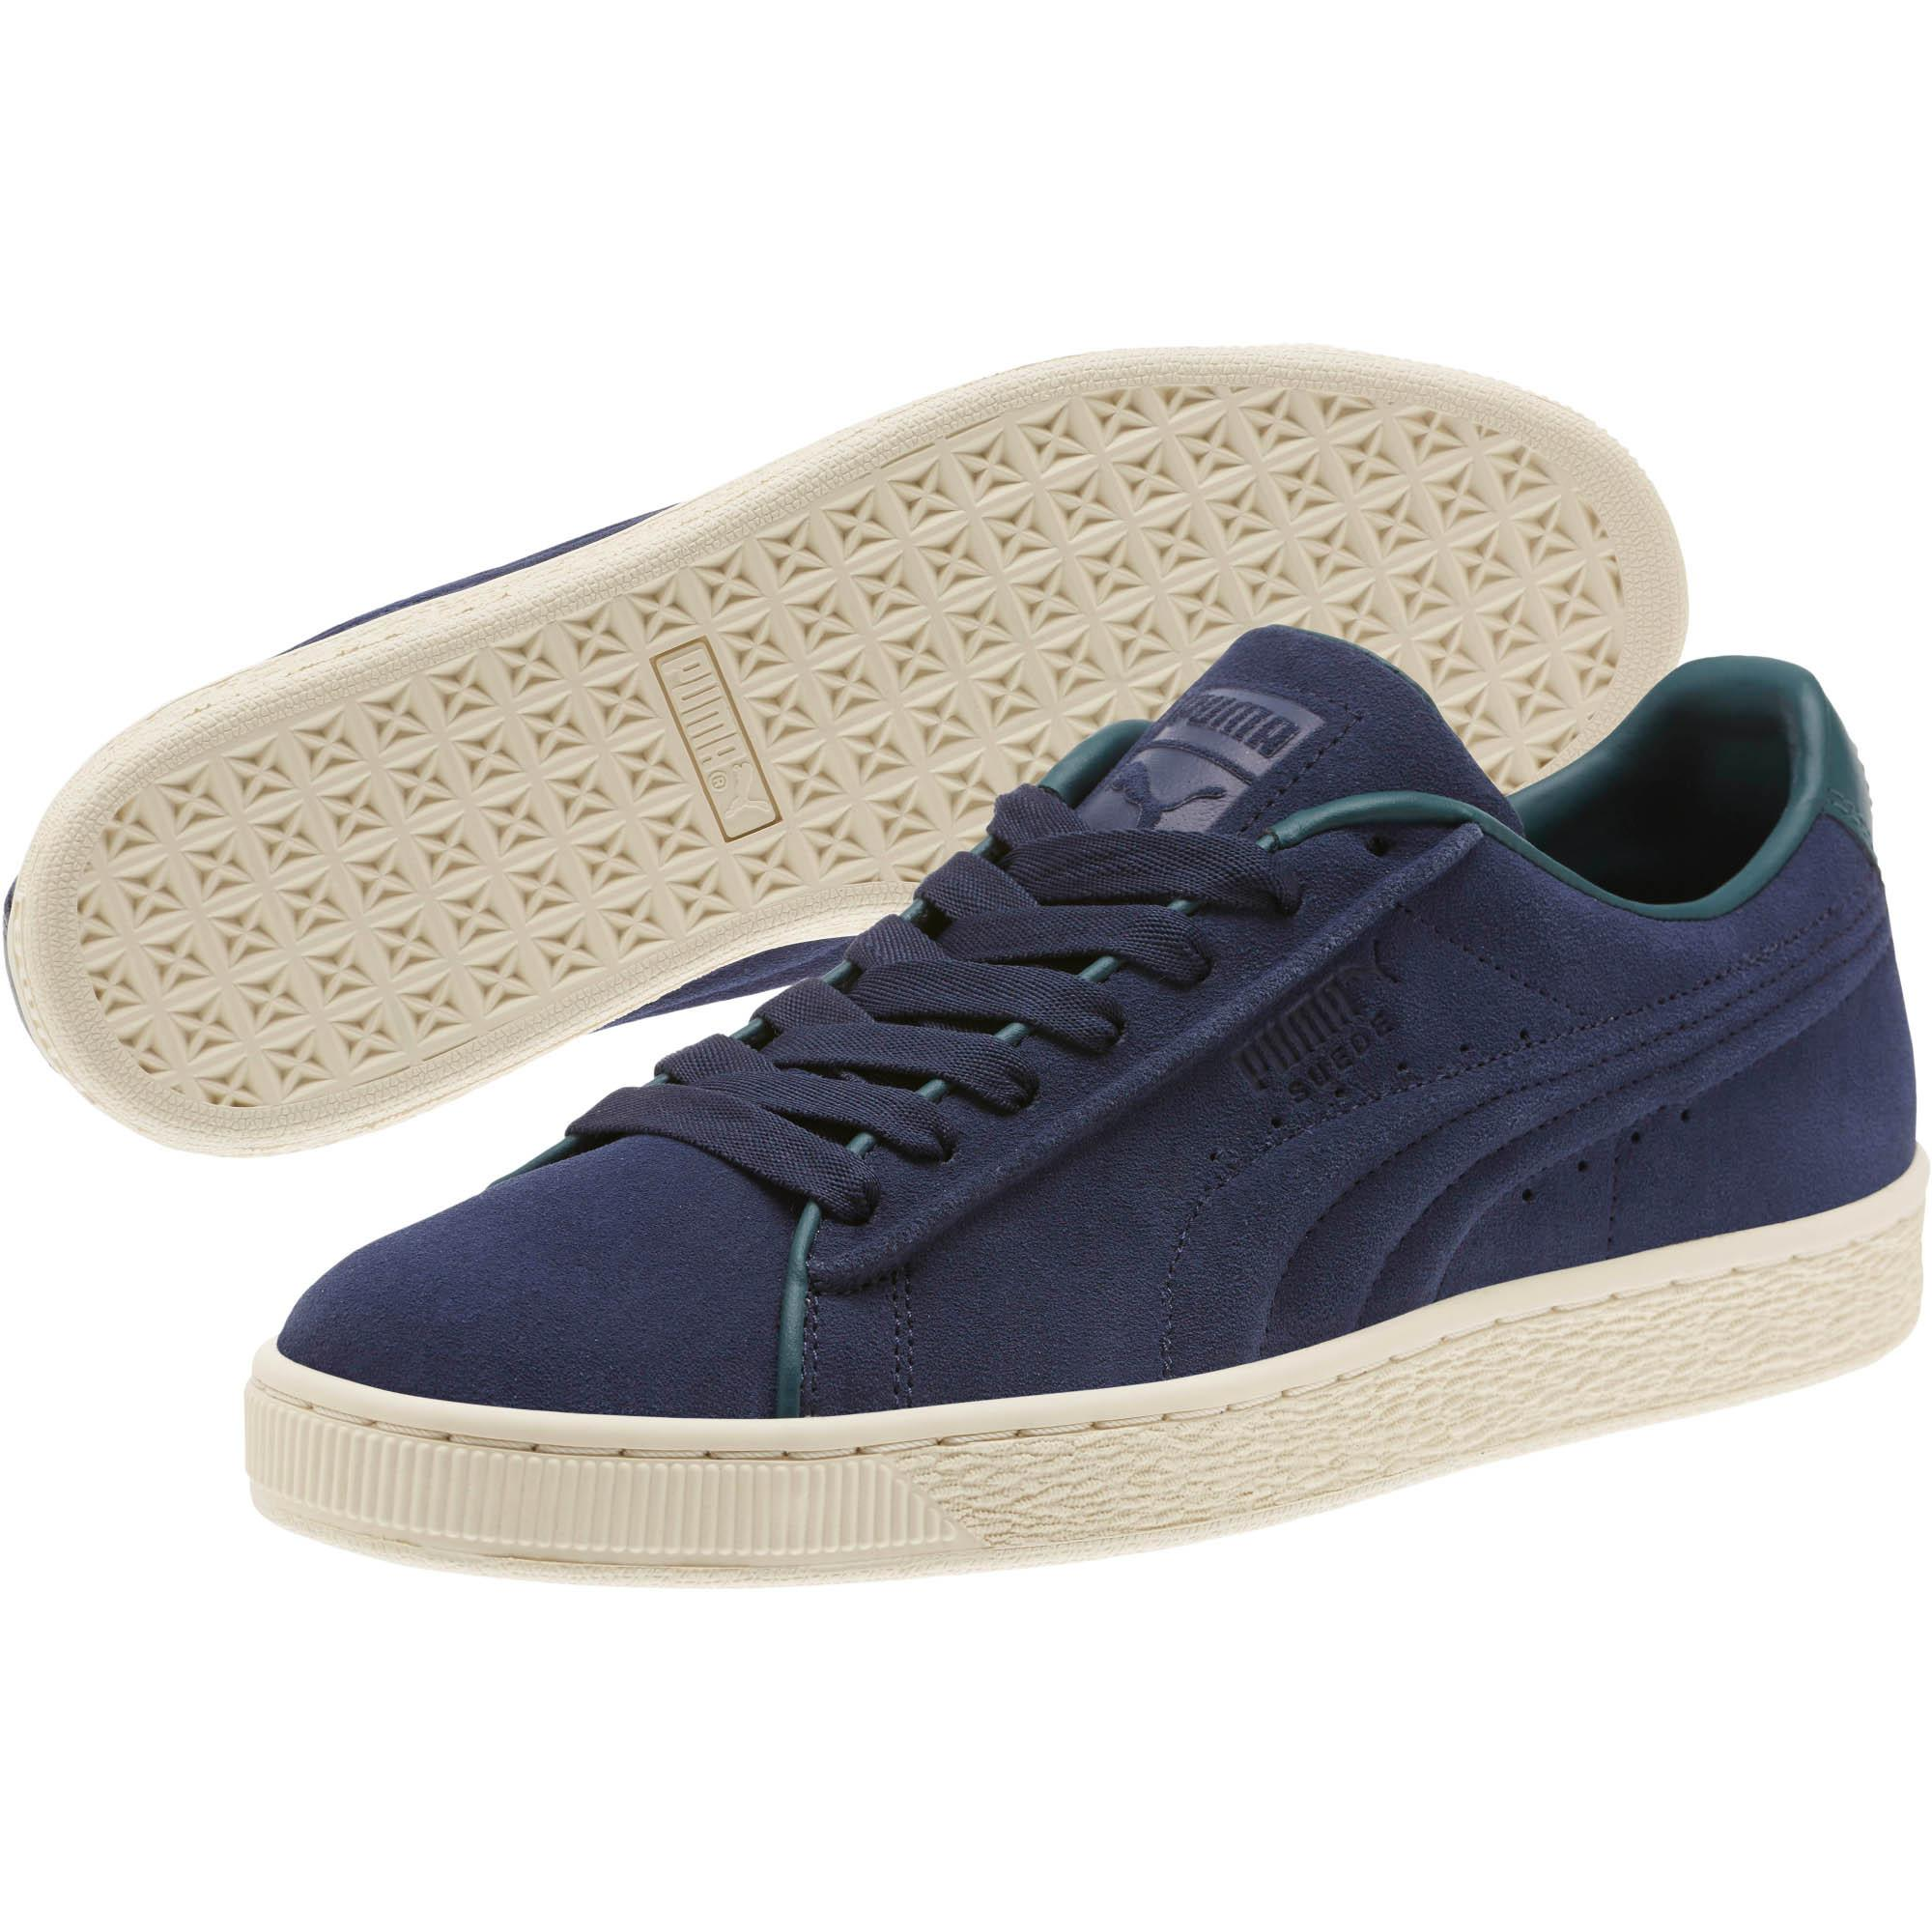 53eb4f1ab02 PUMA - Blue Suede Classic Raised Formstrip Sneakers Unisex Adult - Lyst.  View fullscreen